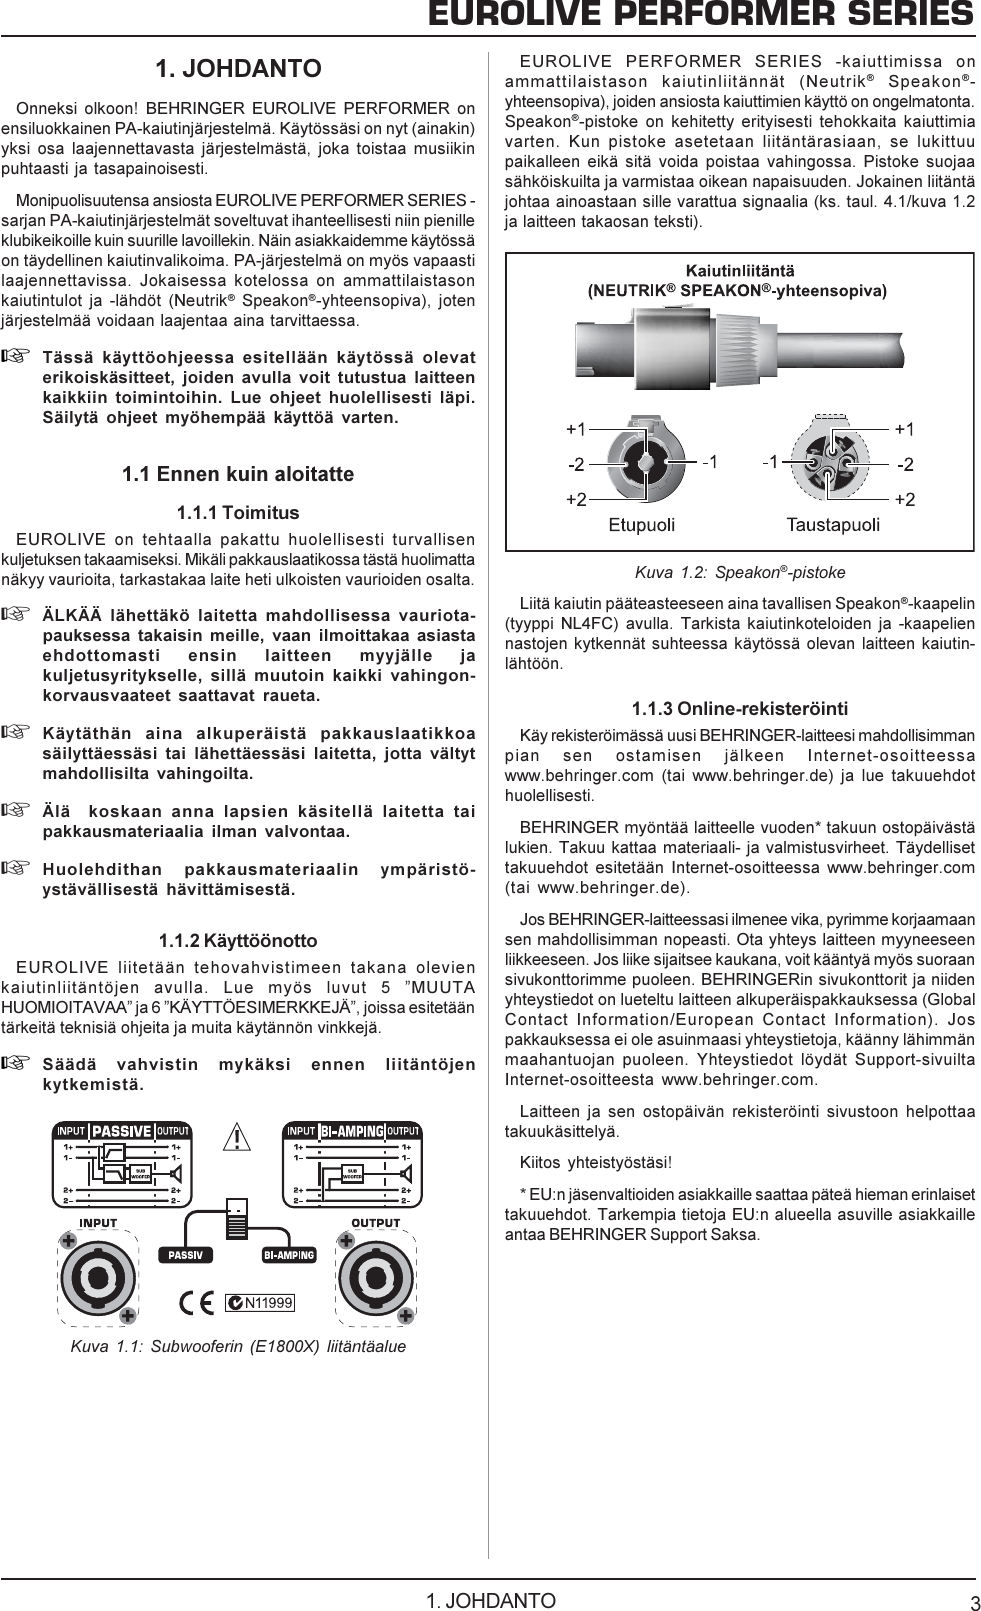 BEHRINGER CX2310 kytkennät